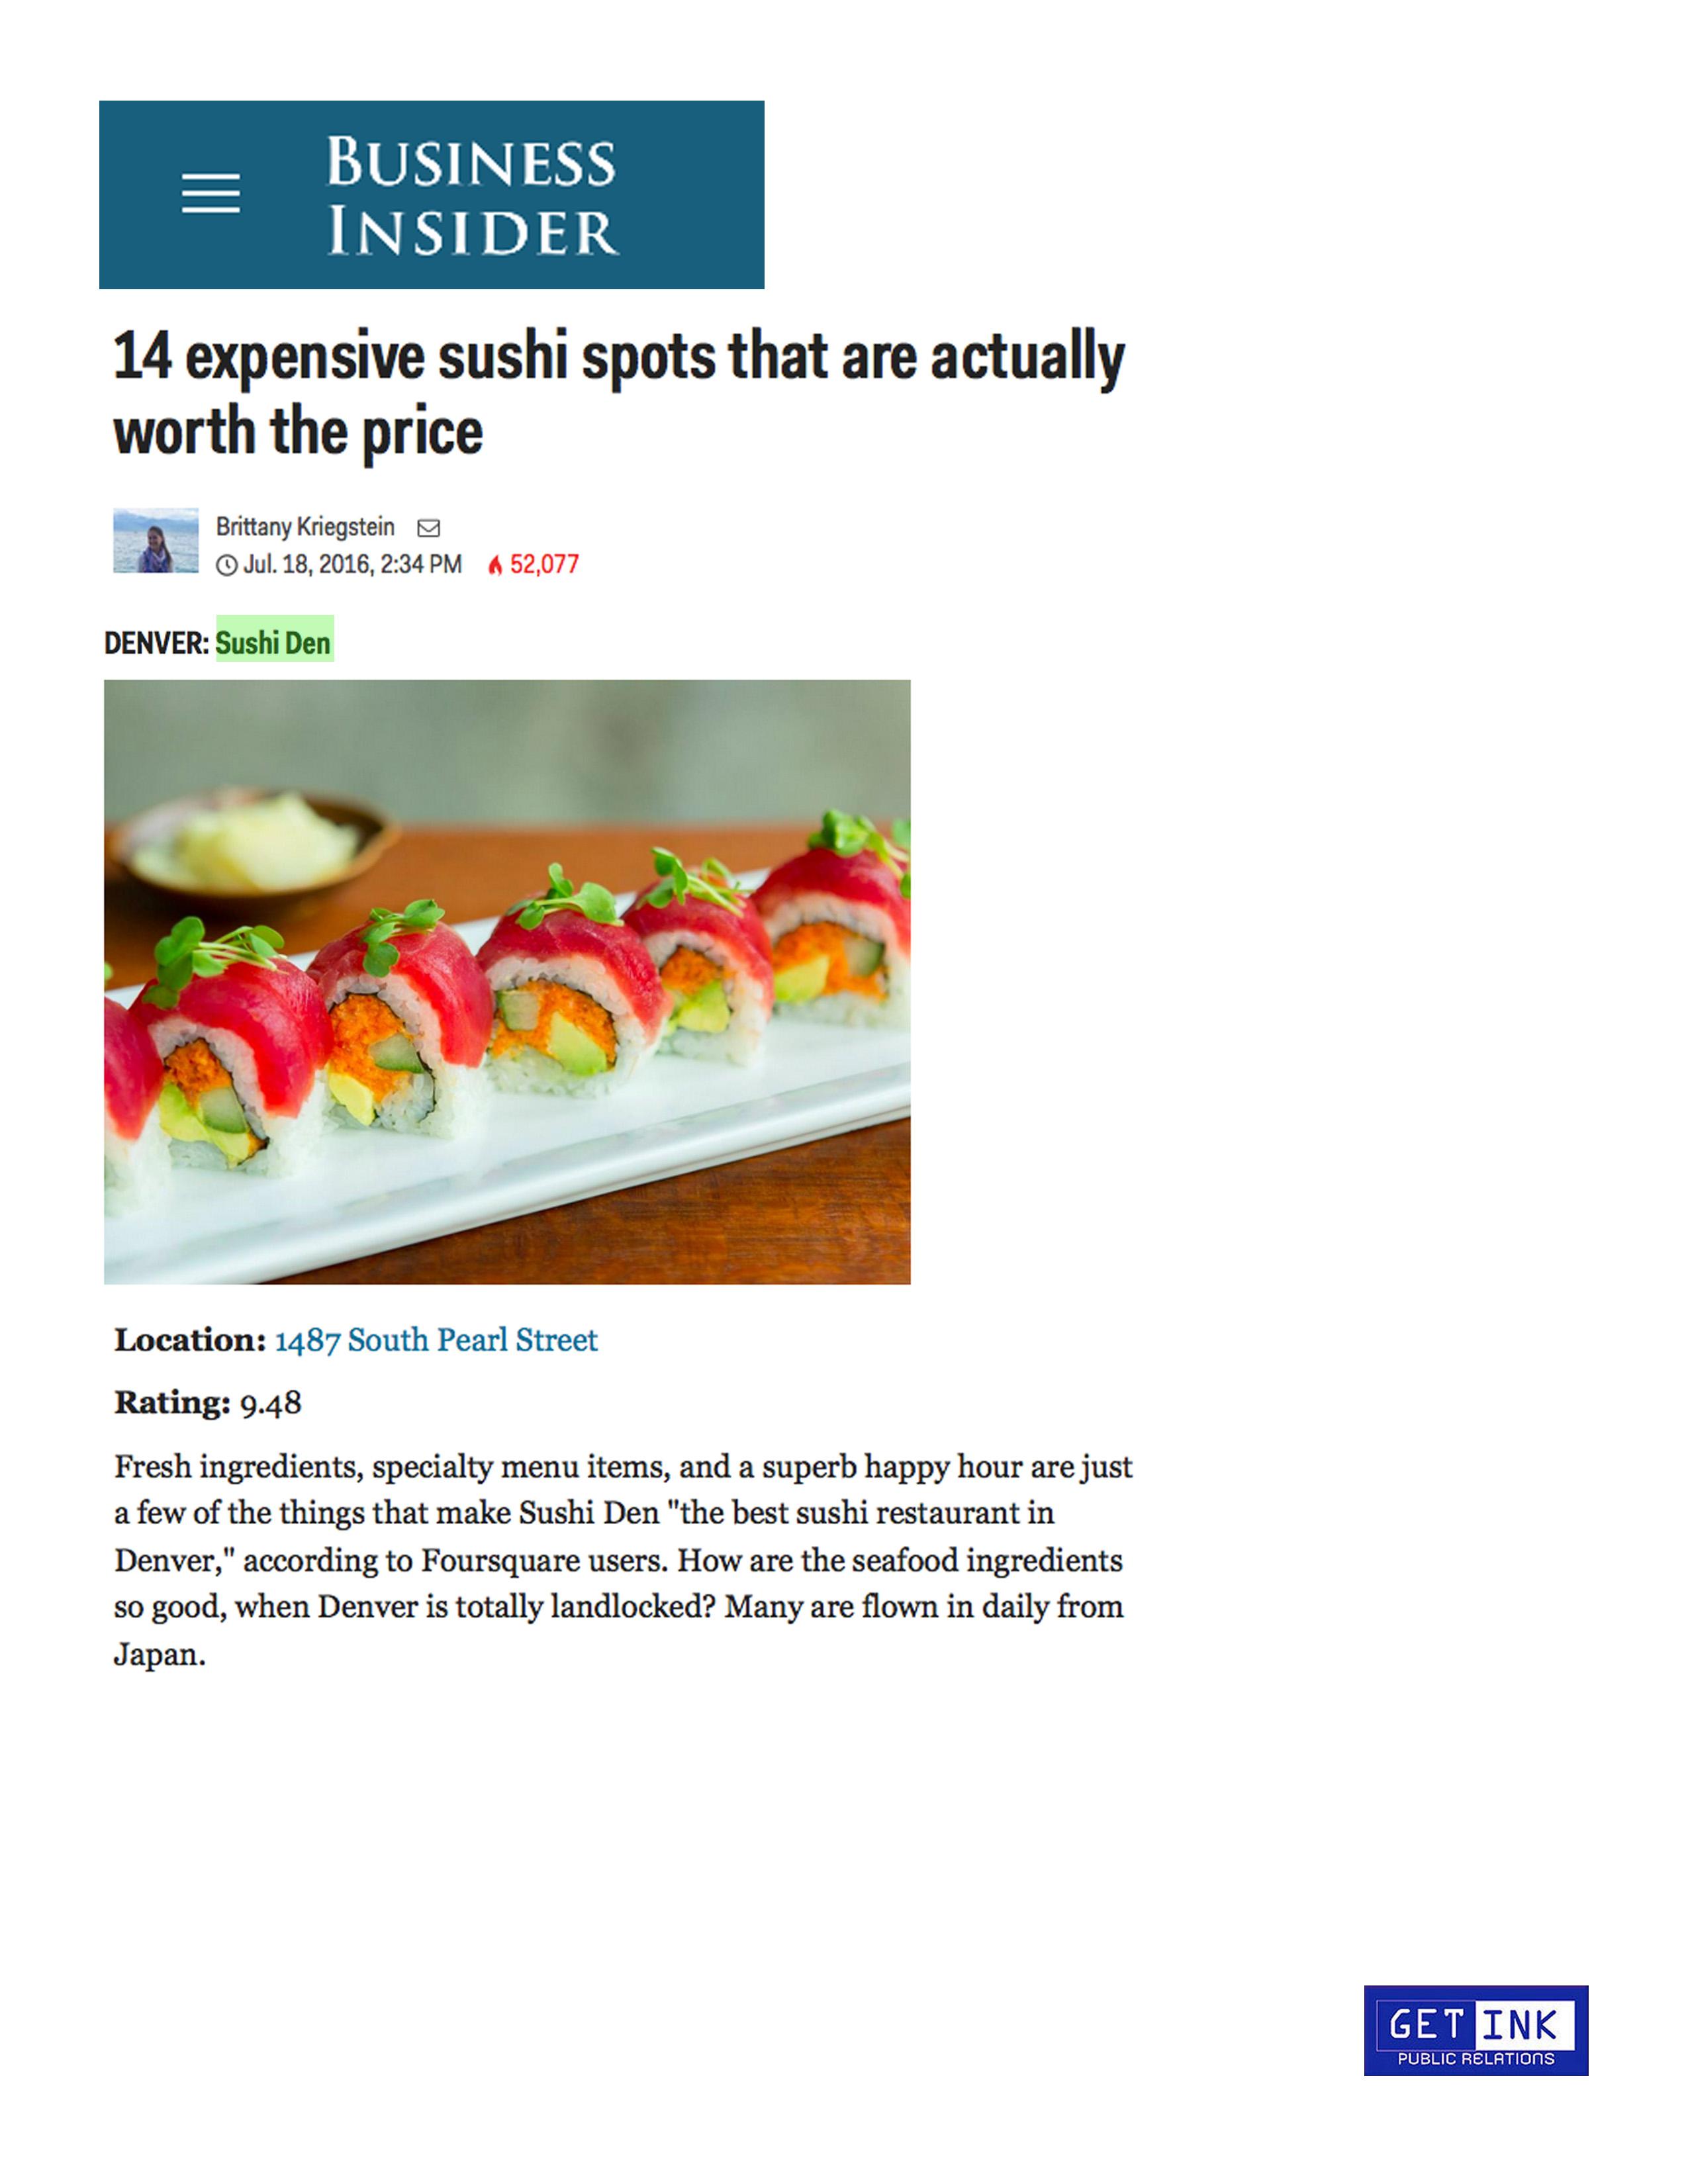 BusinessInsider Sushi Den